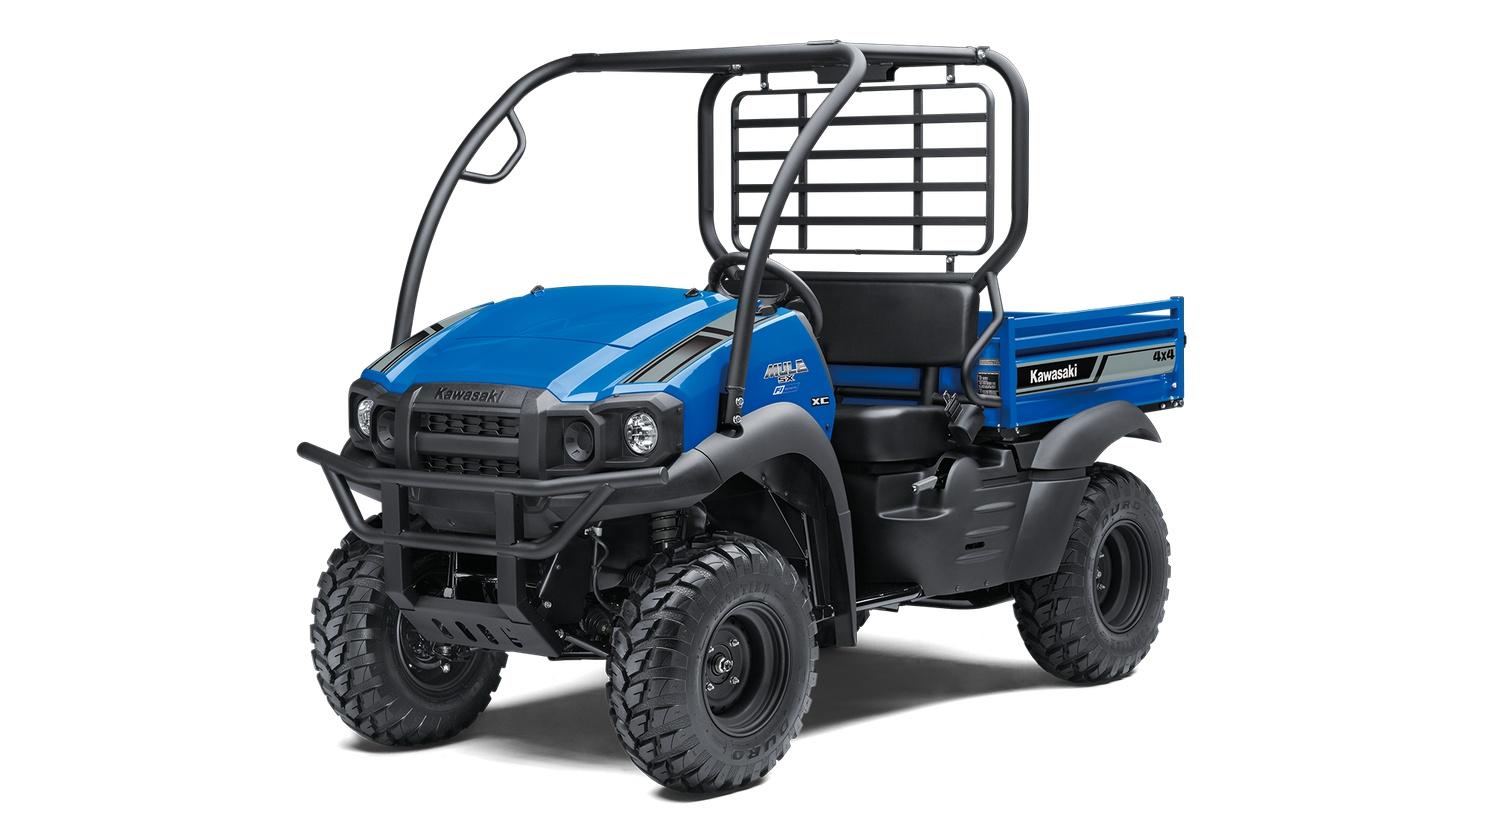 Kawasaki MULE SX 4x4 XC FI Bleu Vibrant 2020